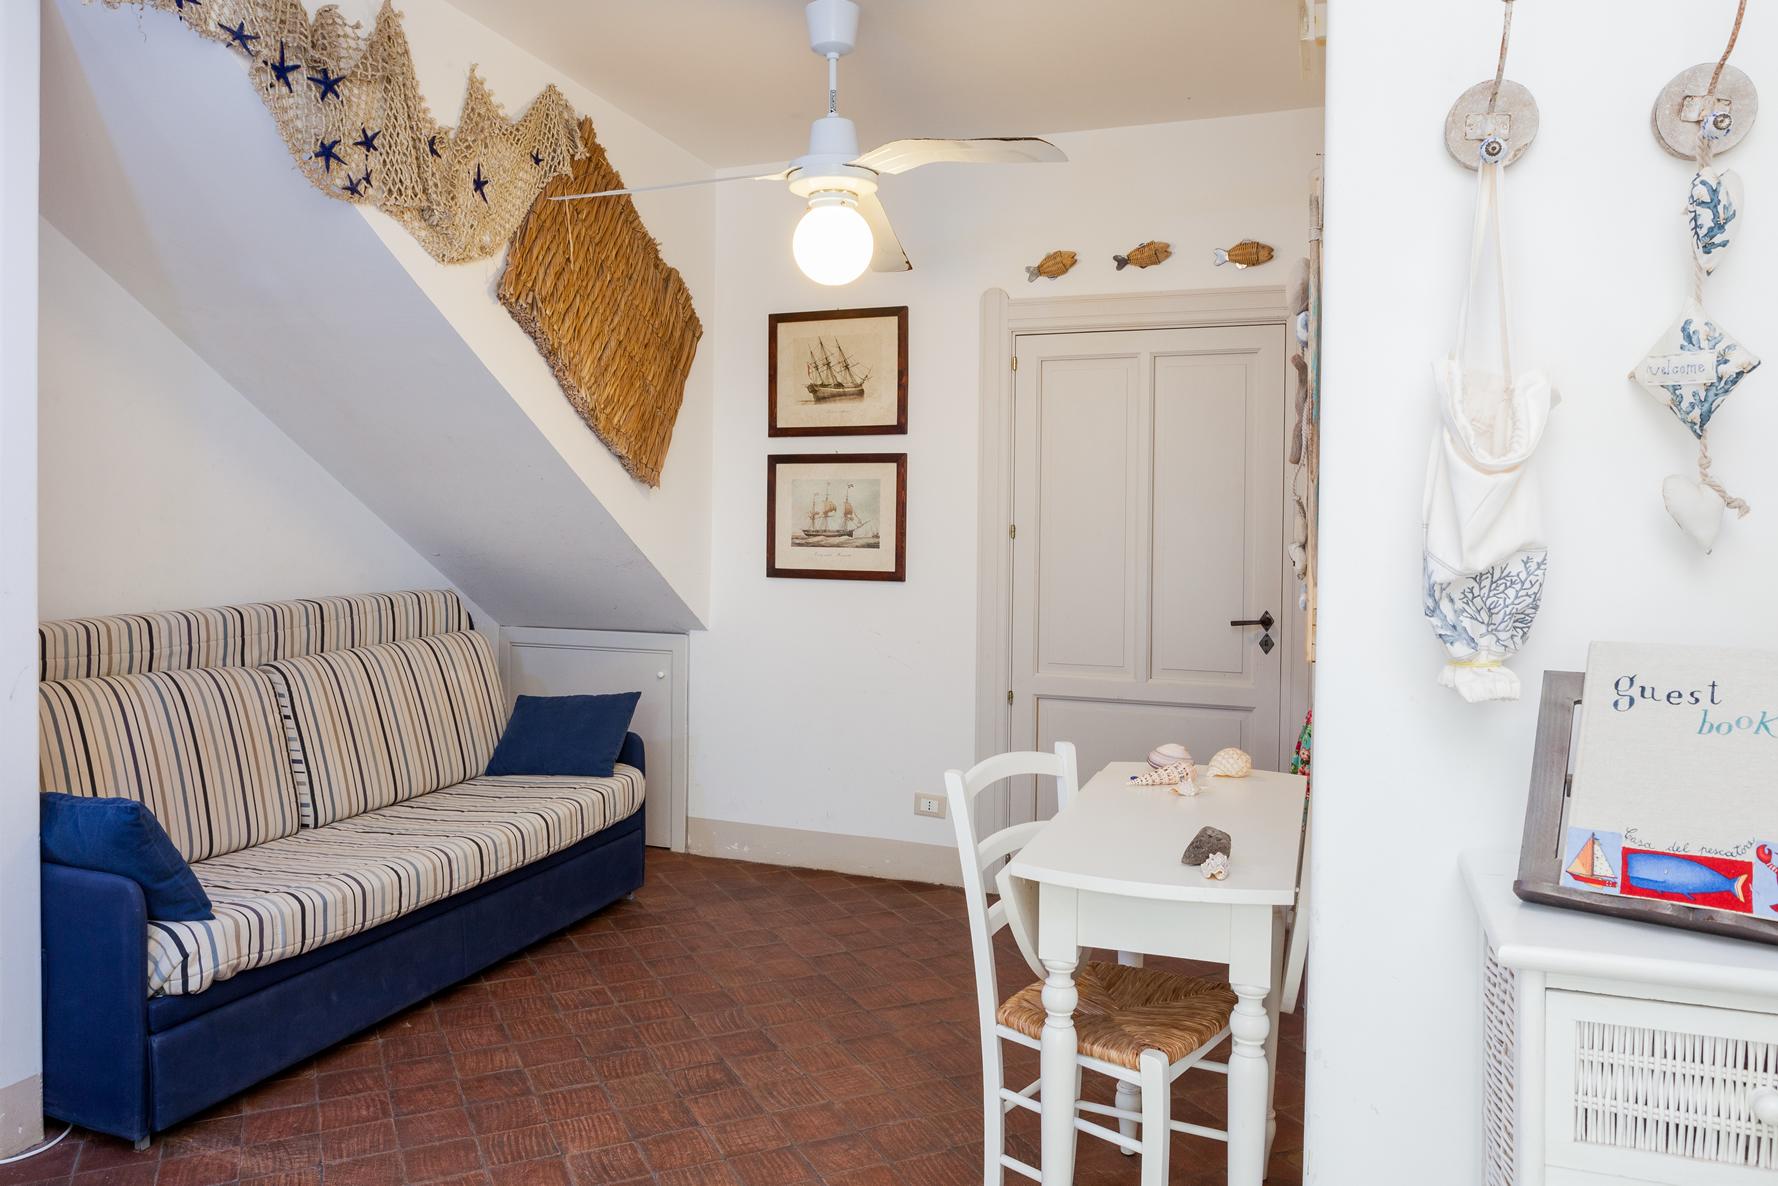 4sampieri-casa-vacanze-sicilia-appartamento-sicily-holiday-apartment-casa-del-pescatore-italia-italy.jpg